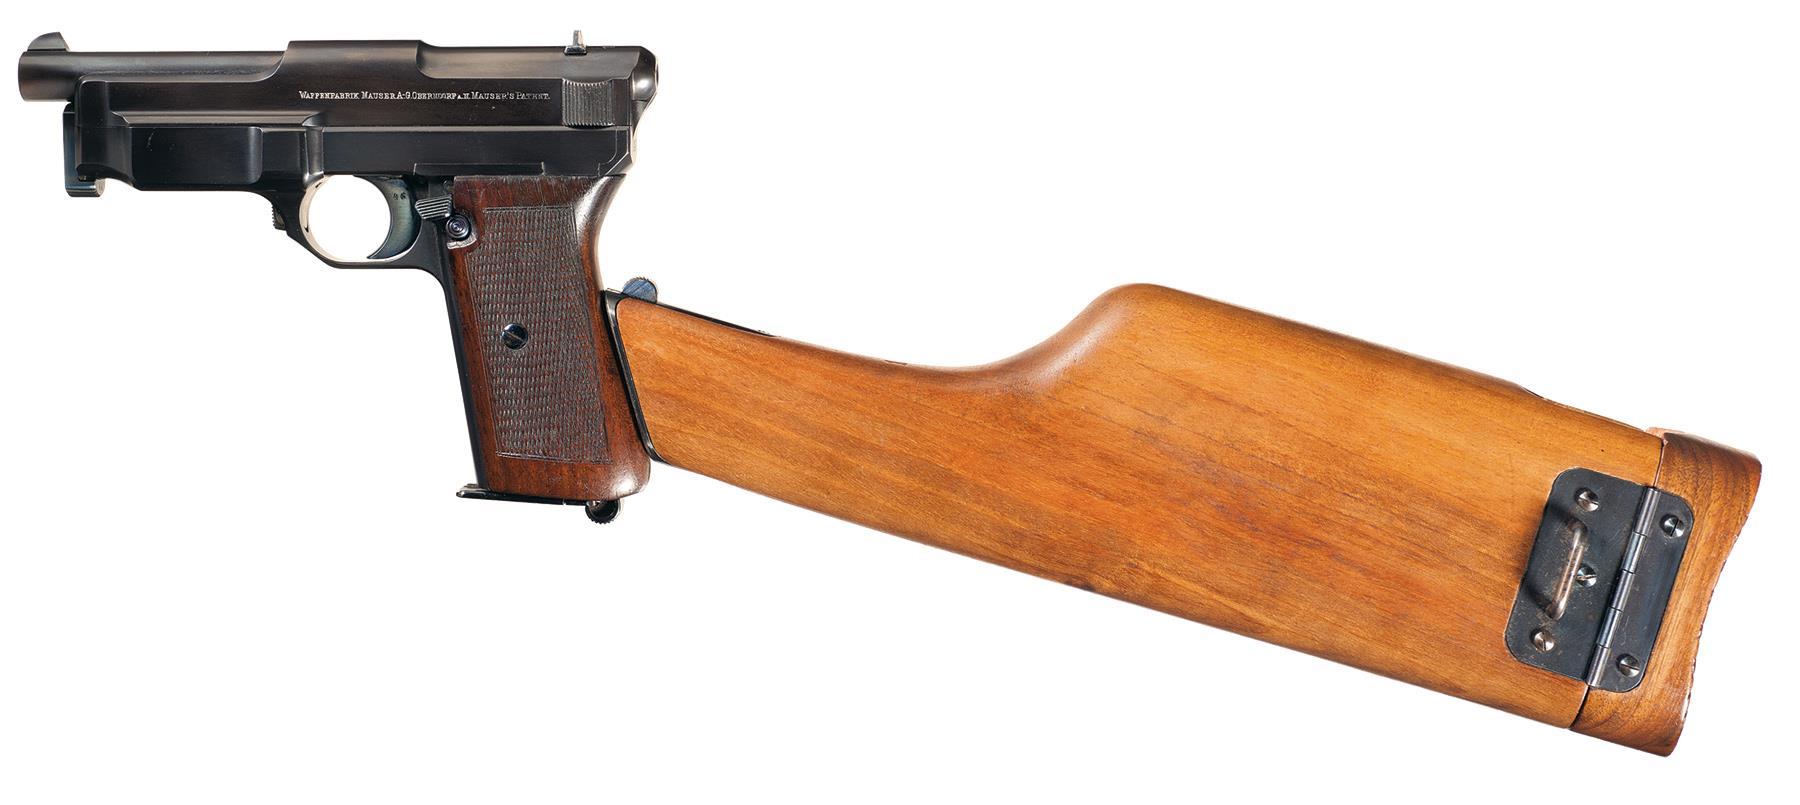 Gun Mauser Pistol Early Nineteenth Century Stock Image - Image ...